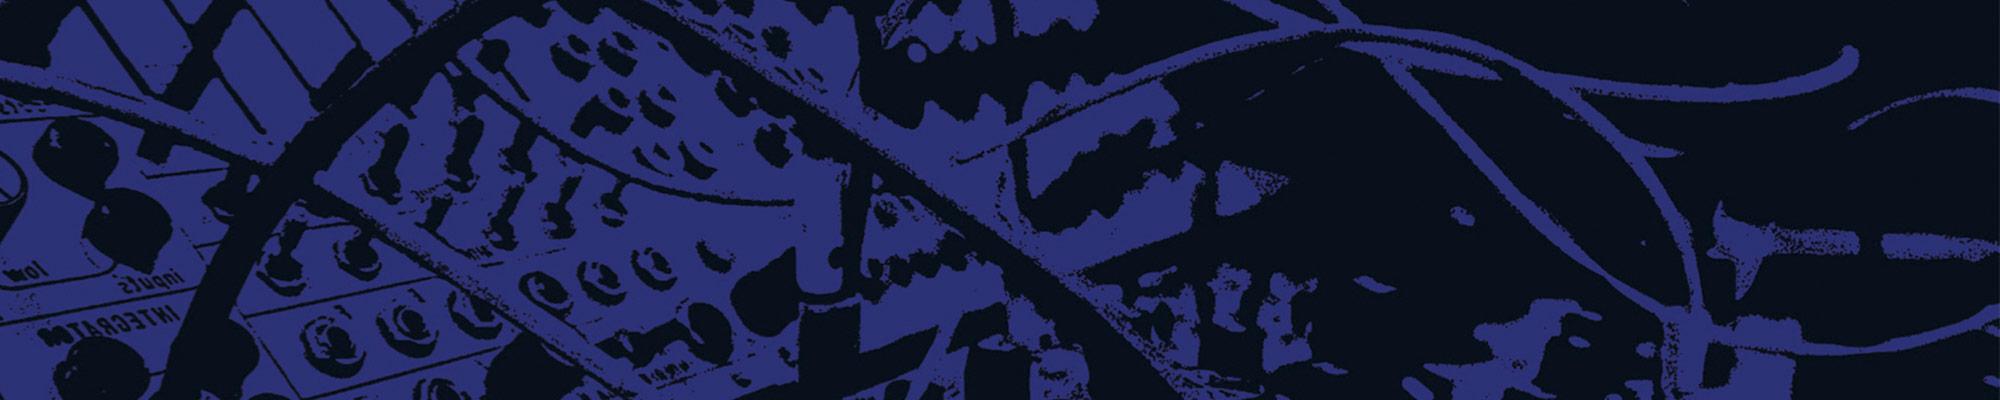 Wonderment 2019 – Live Ambient Music | Garden City